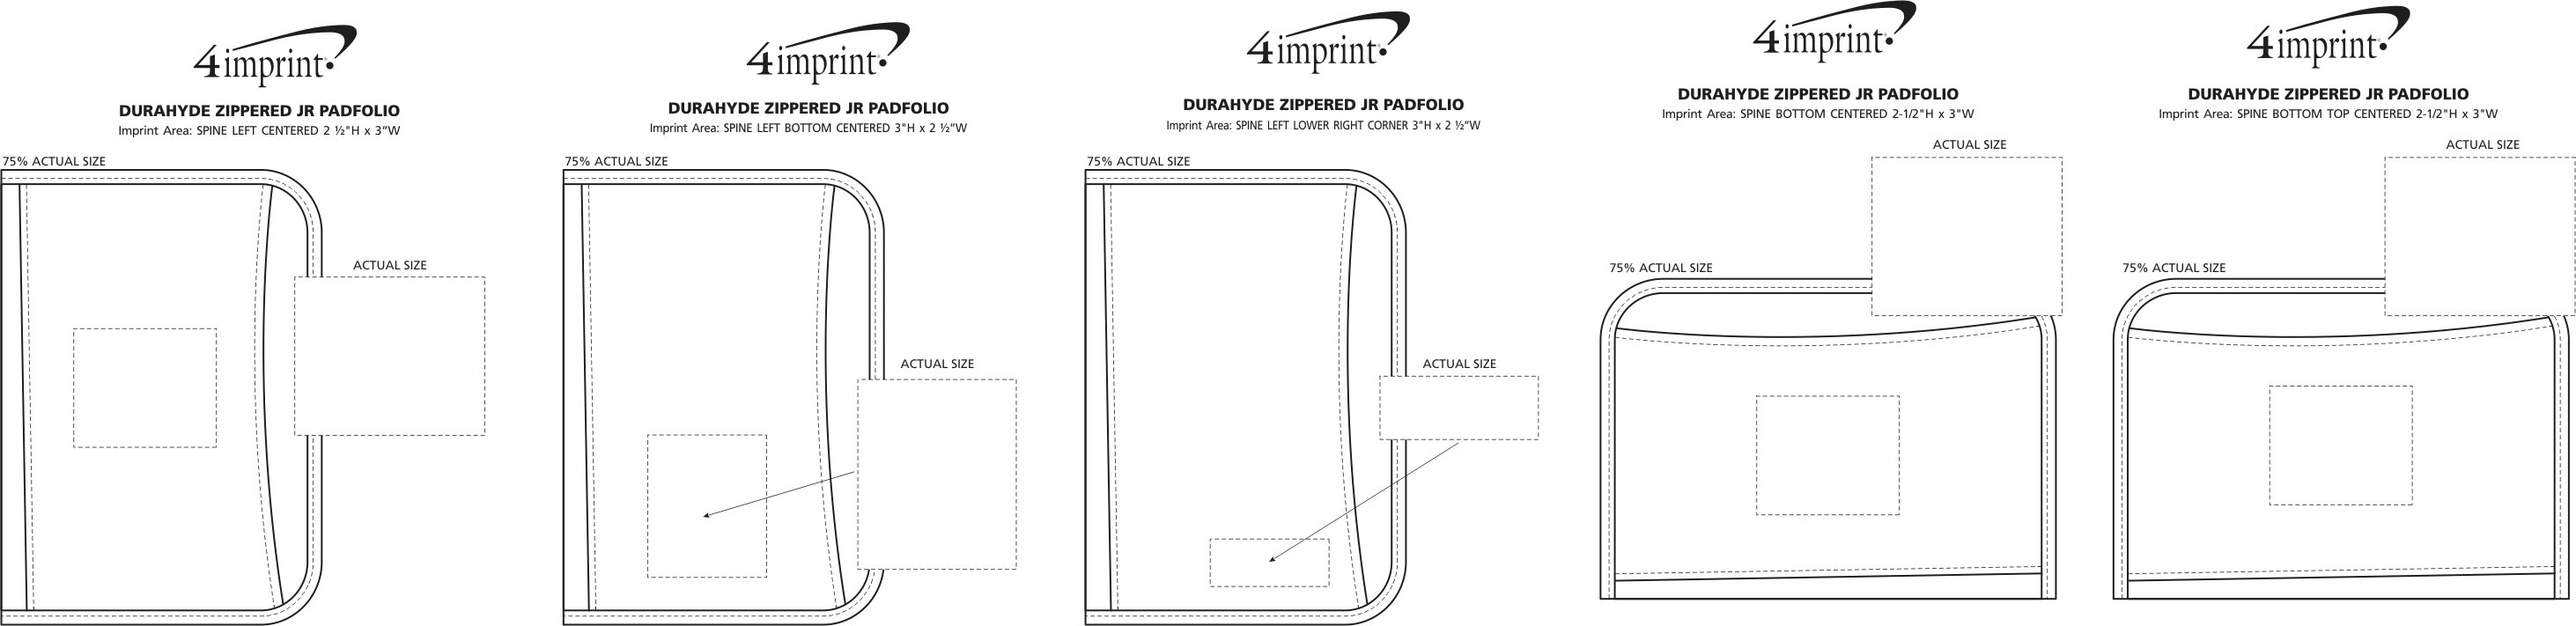 Imprint Area of DuraHyde Zippered Jr. Padfolio